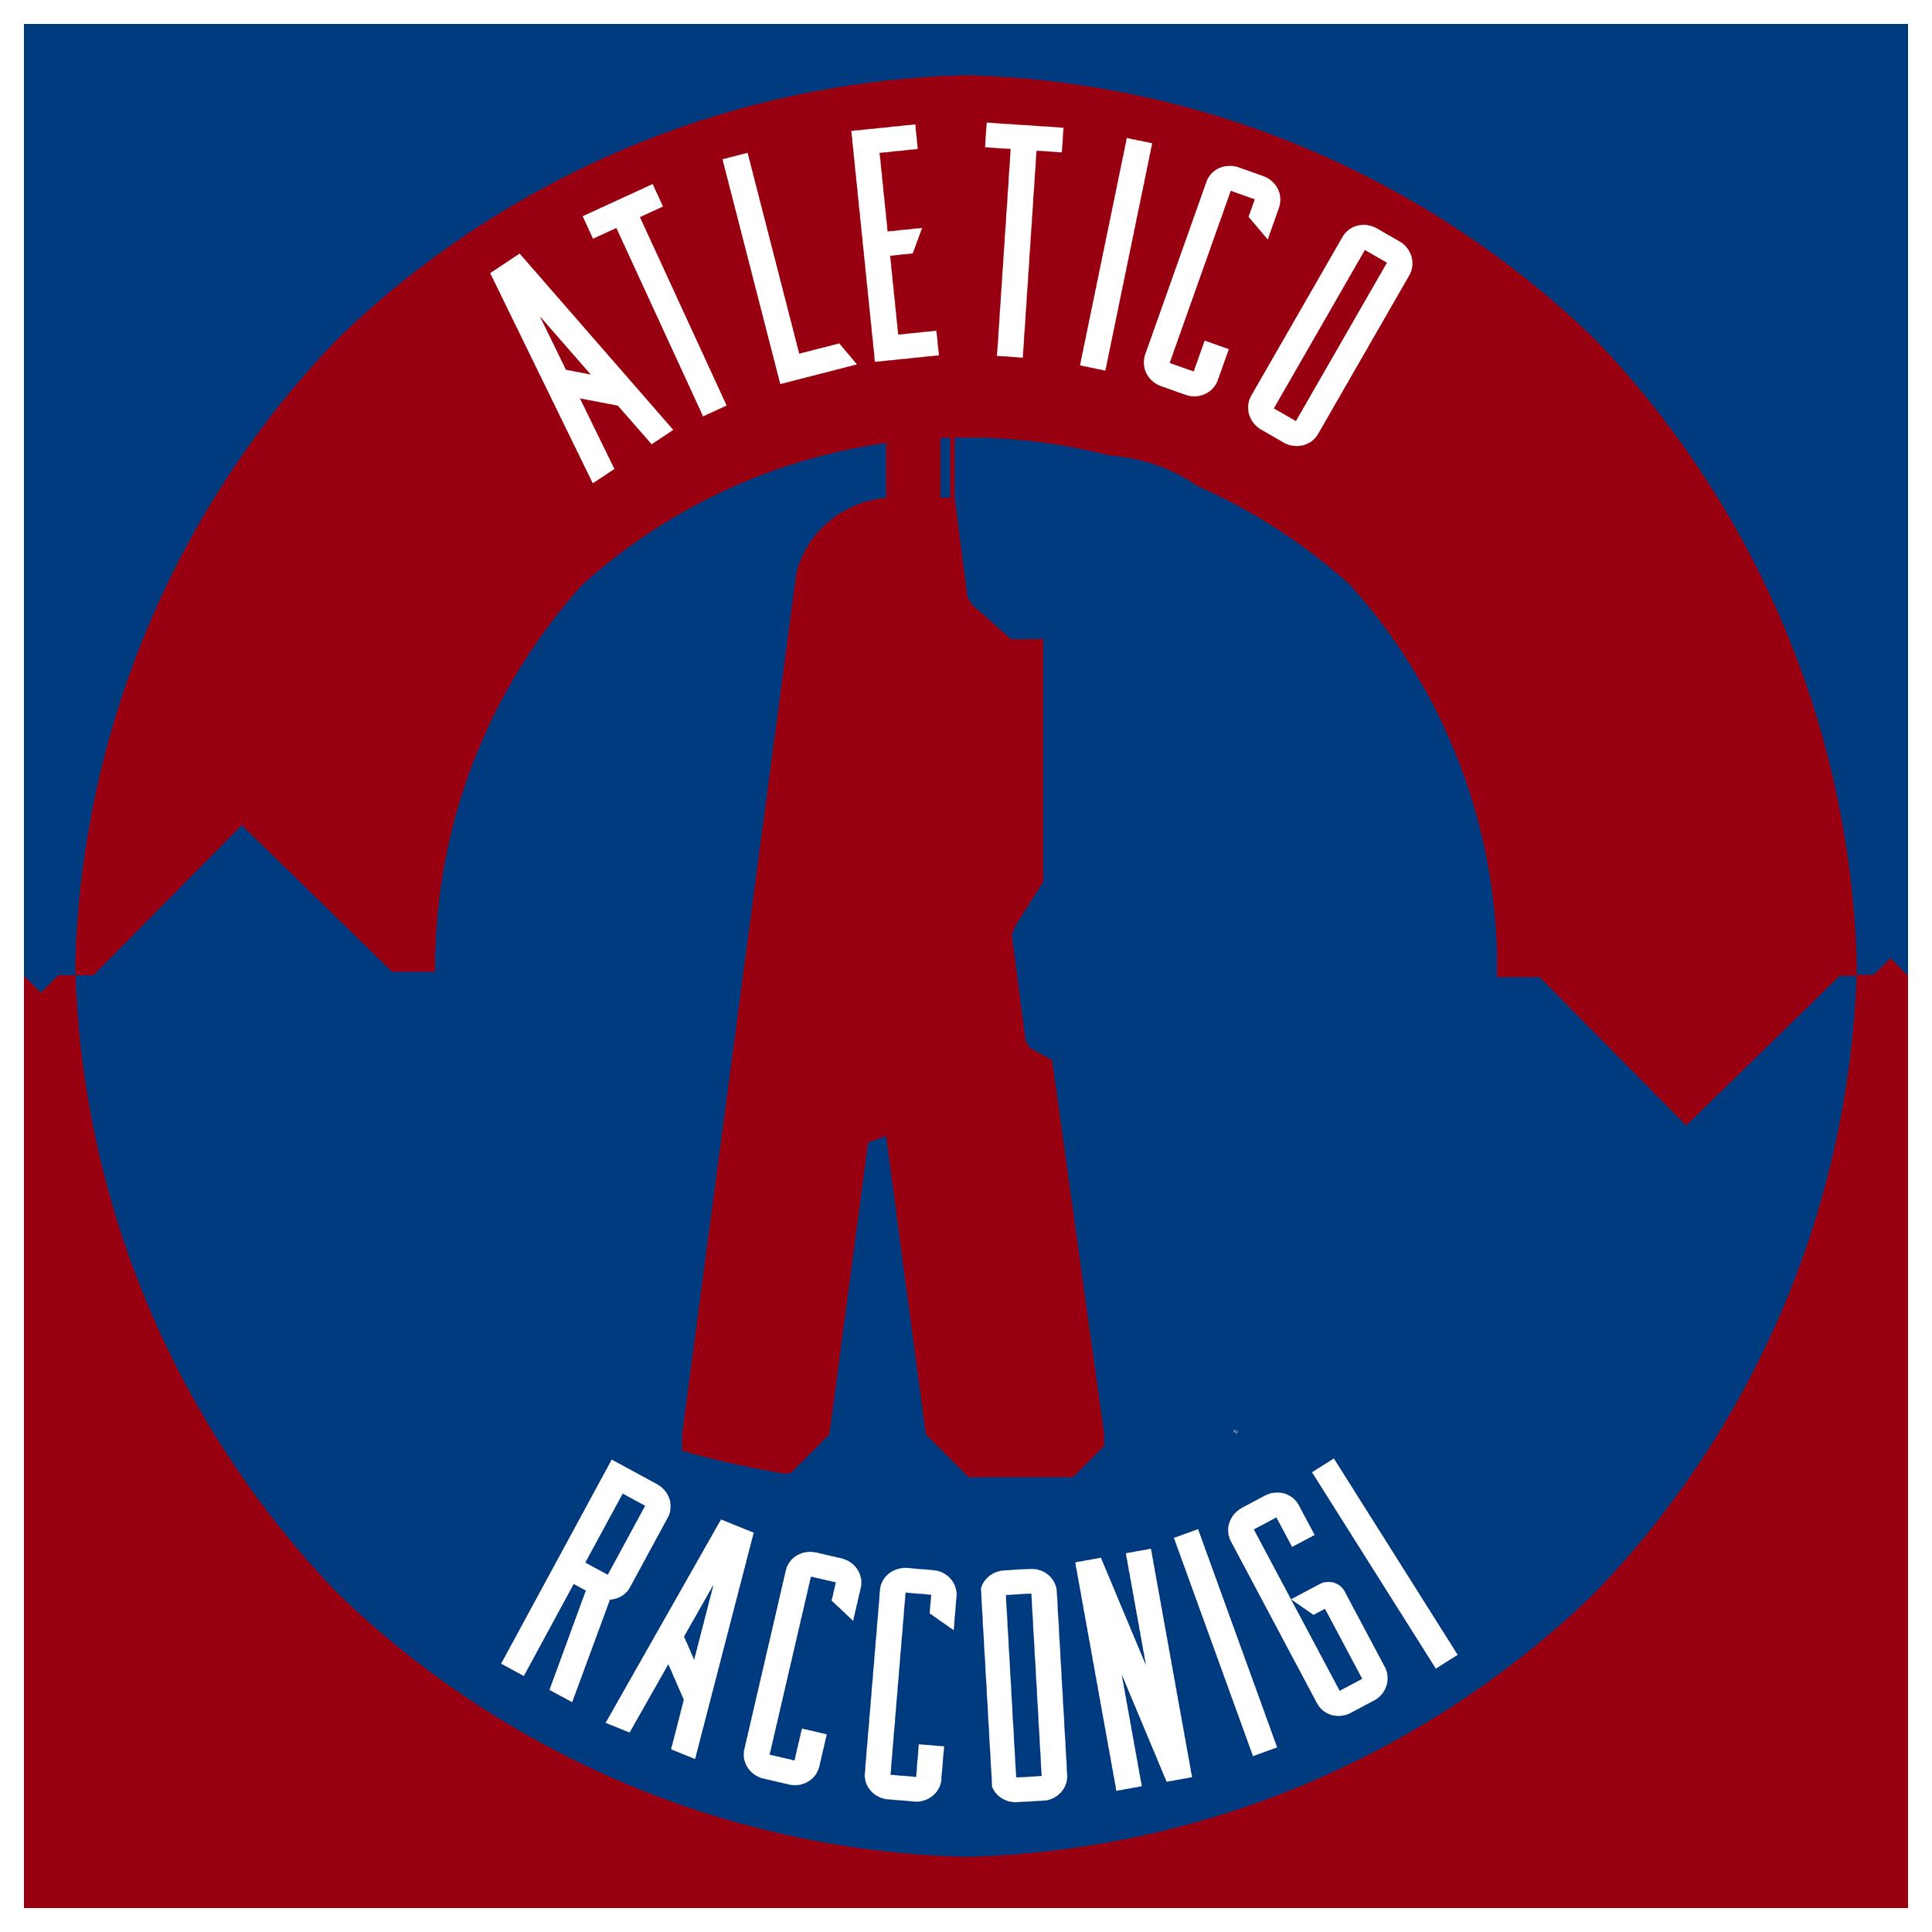 AtleticoRacconigi.it